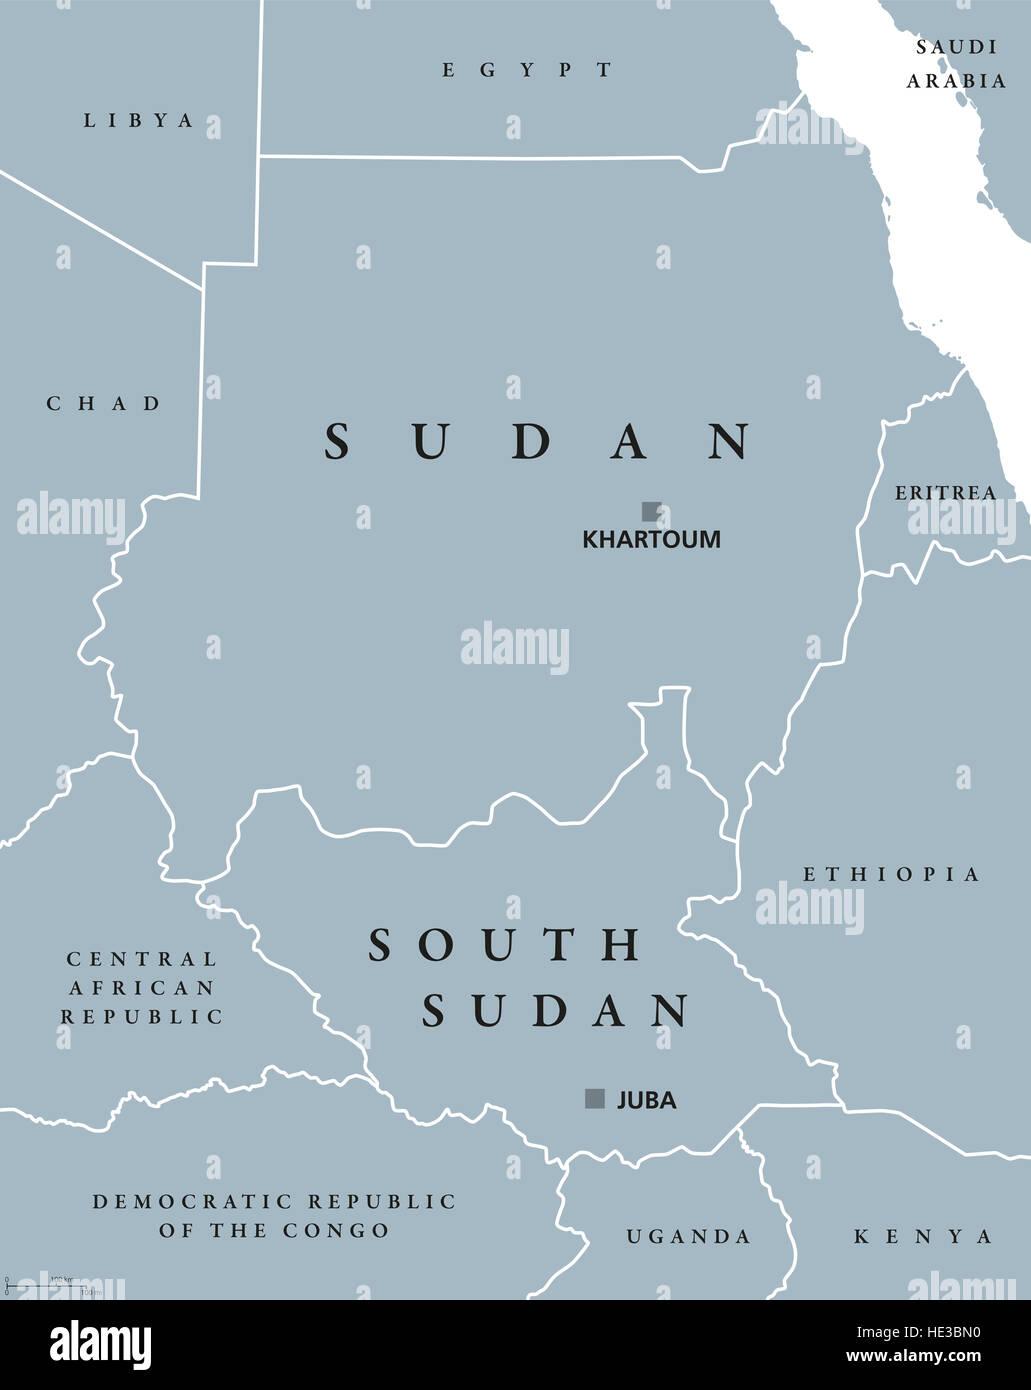 Political Map Of South Sudan.Sudan And South Sudan Political Map With Capitals Khartoum And Juba